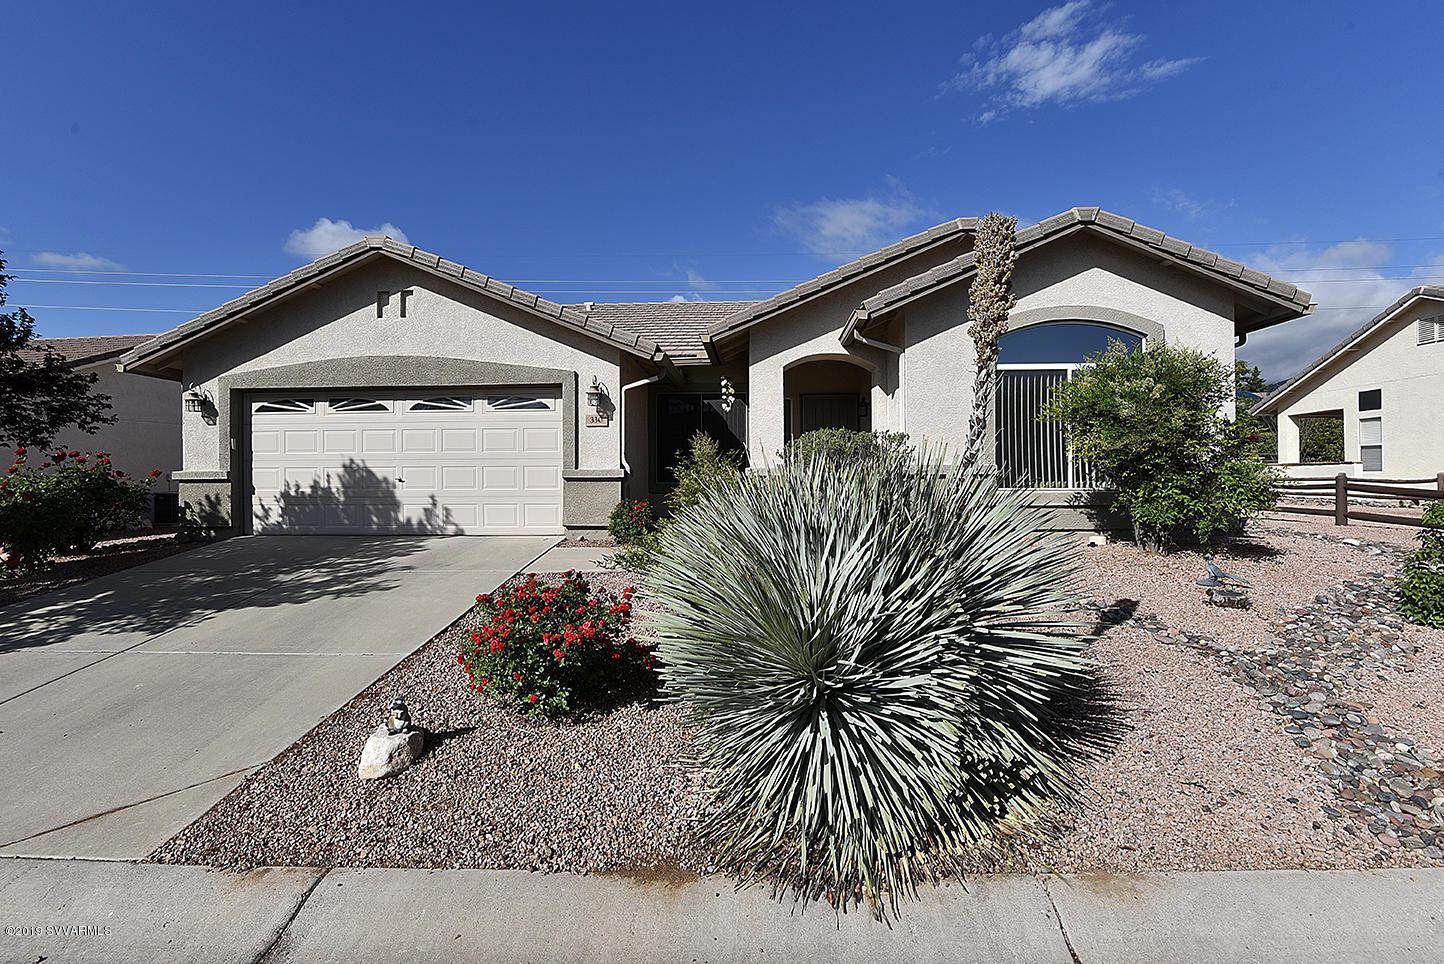 330 S Wild Horse Way Cottonwood, AZ 86326